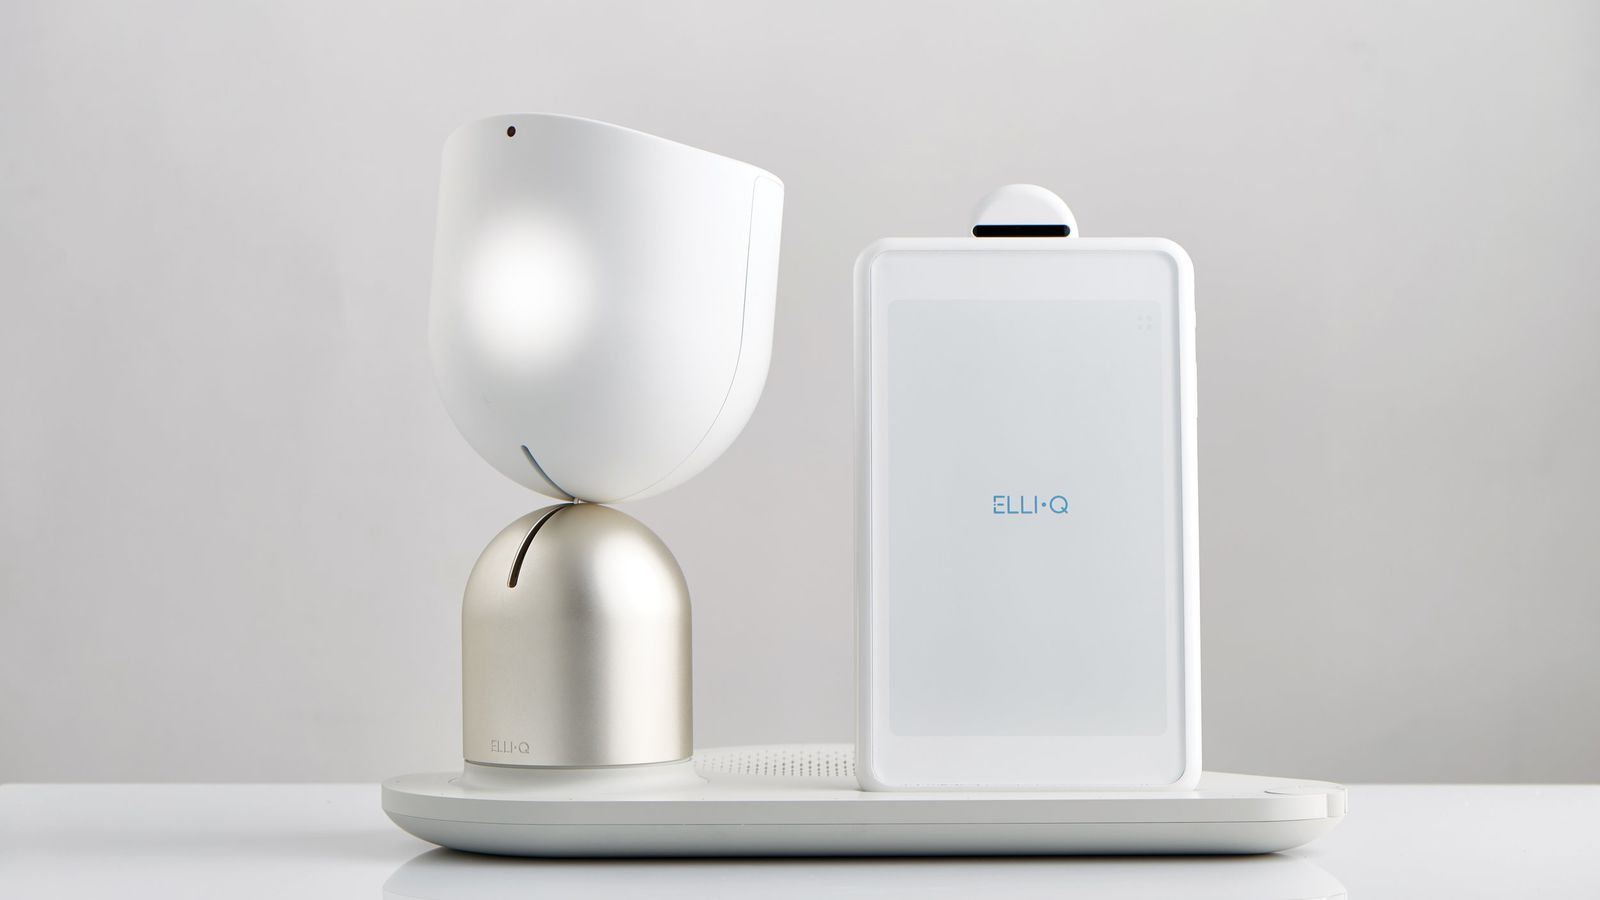 ElliQ is a Friendly Shaped Amazon Alexa for the Elderly